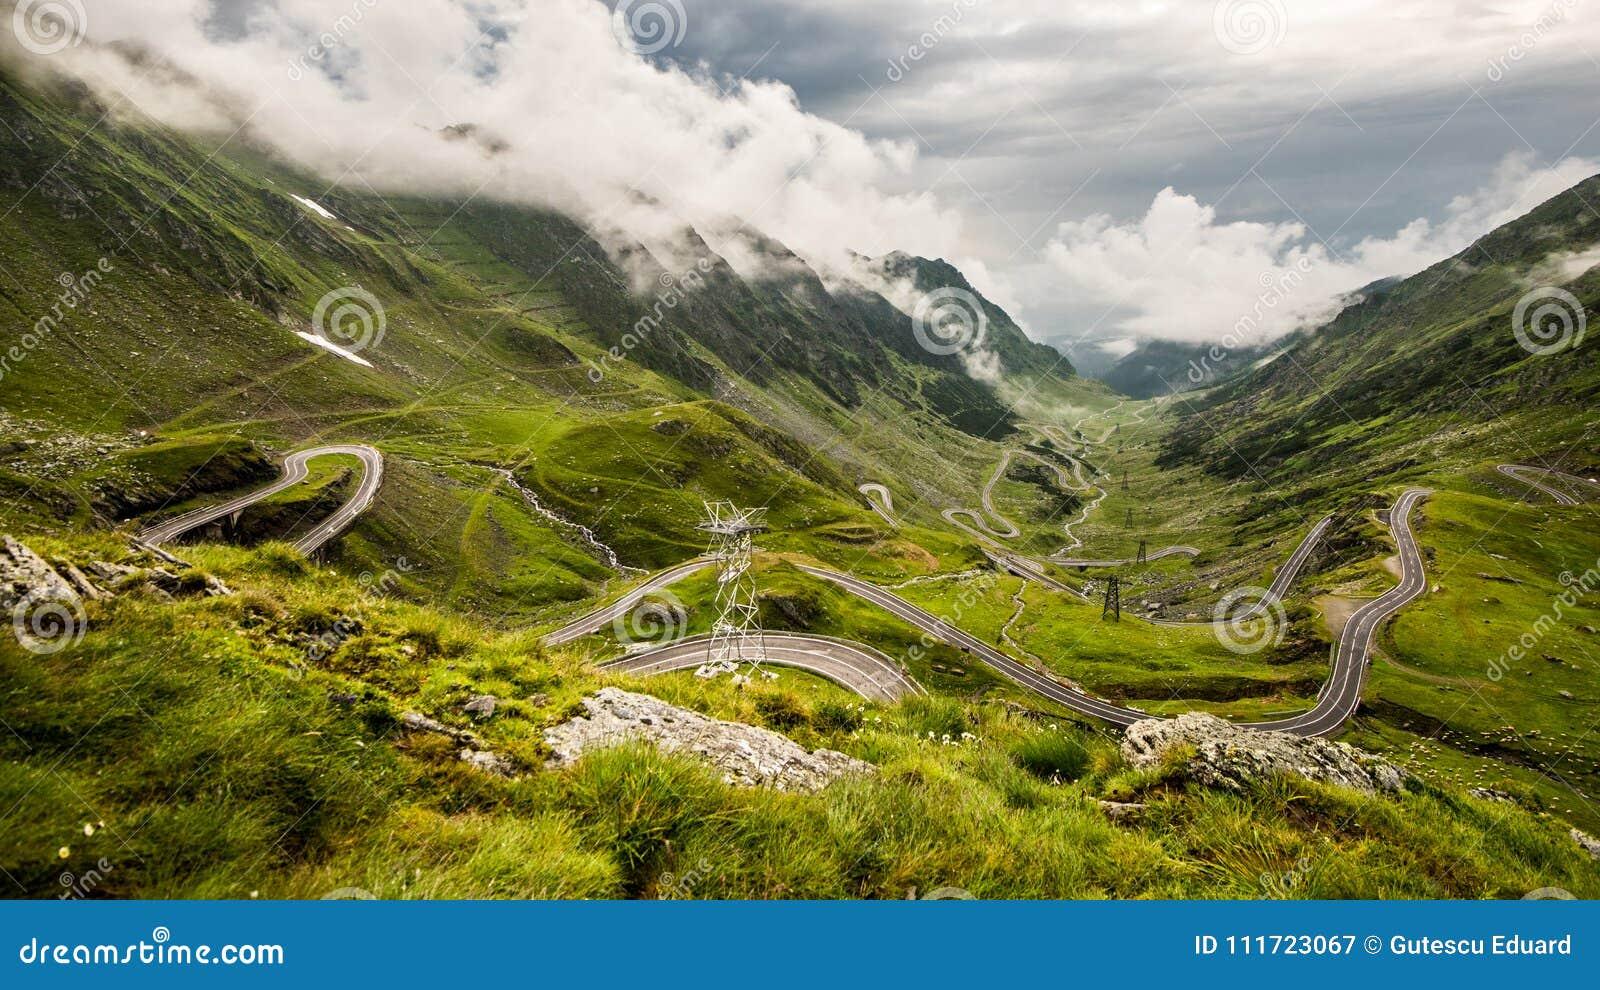 Route de Transfagarasan sur la montagne de Fagaras, Roumanie